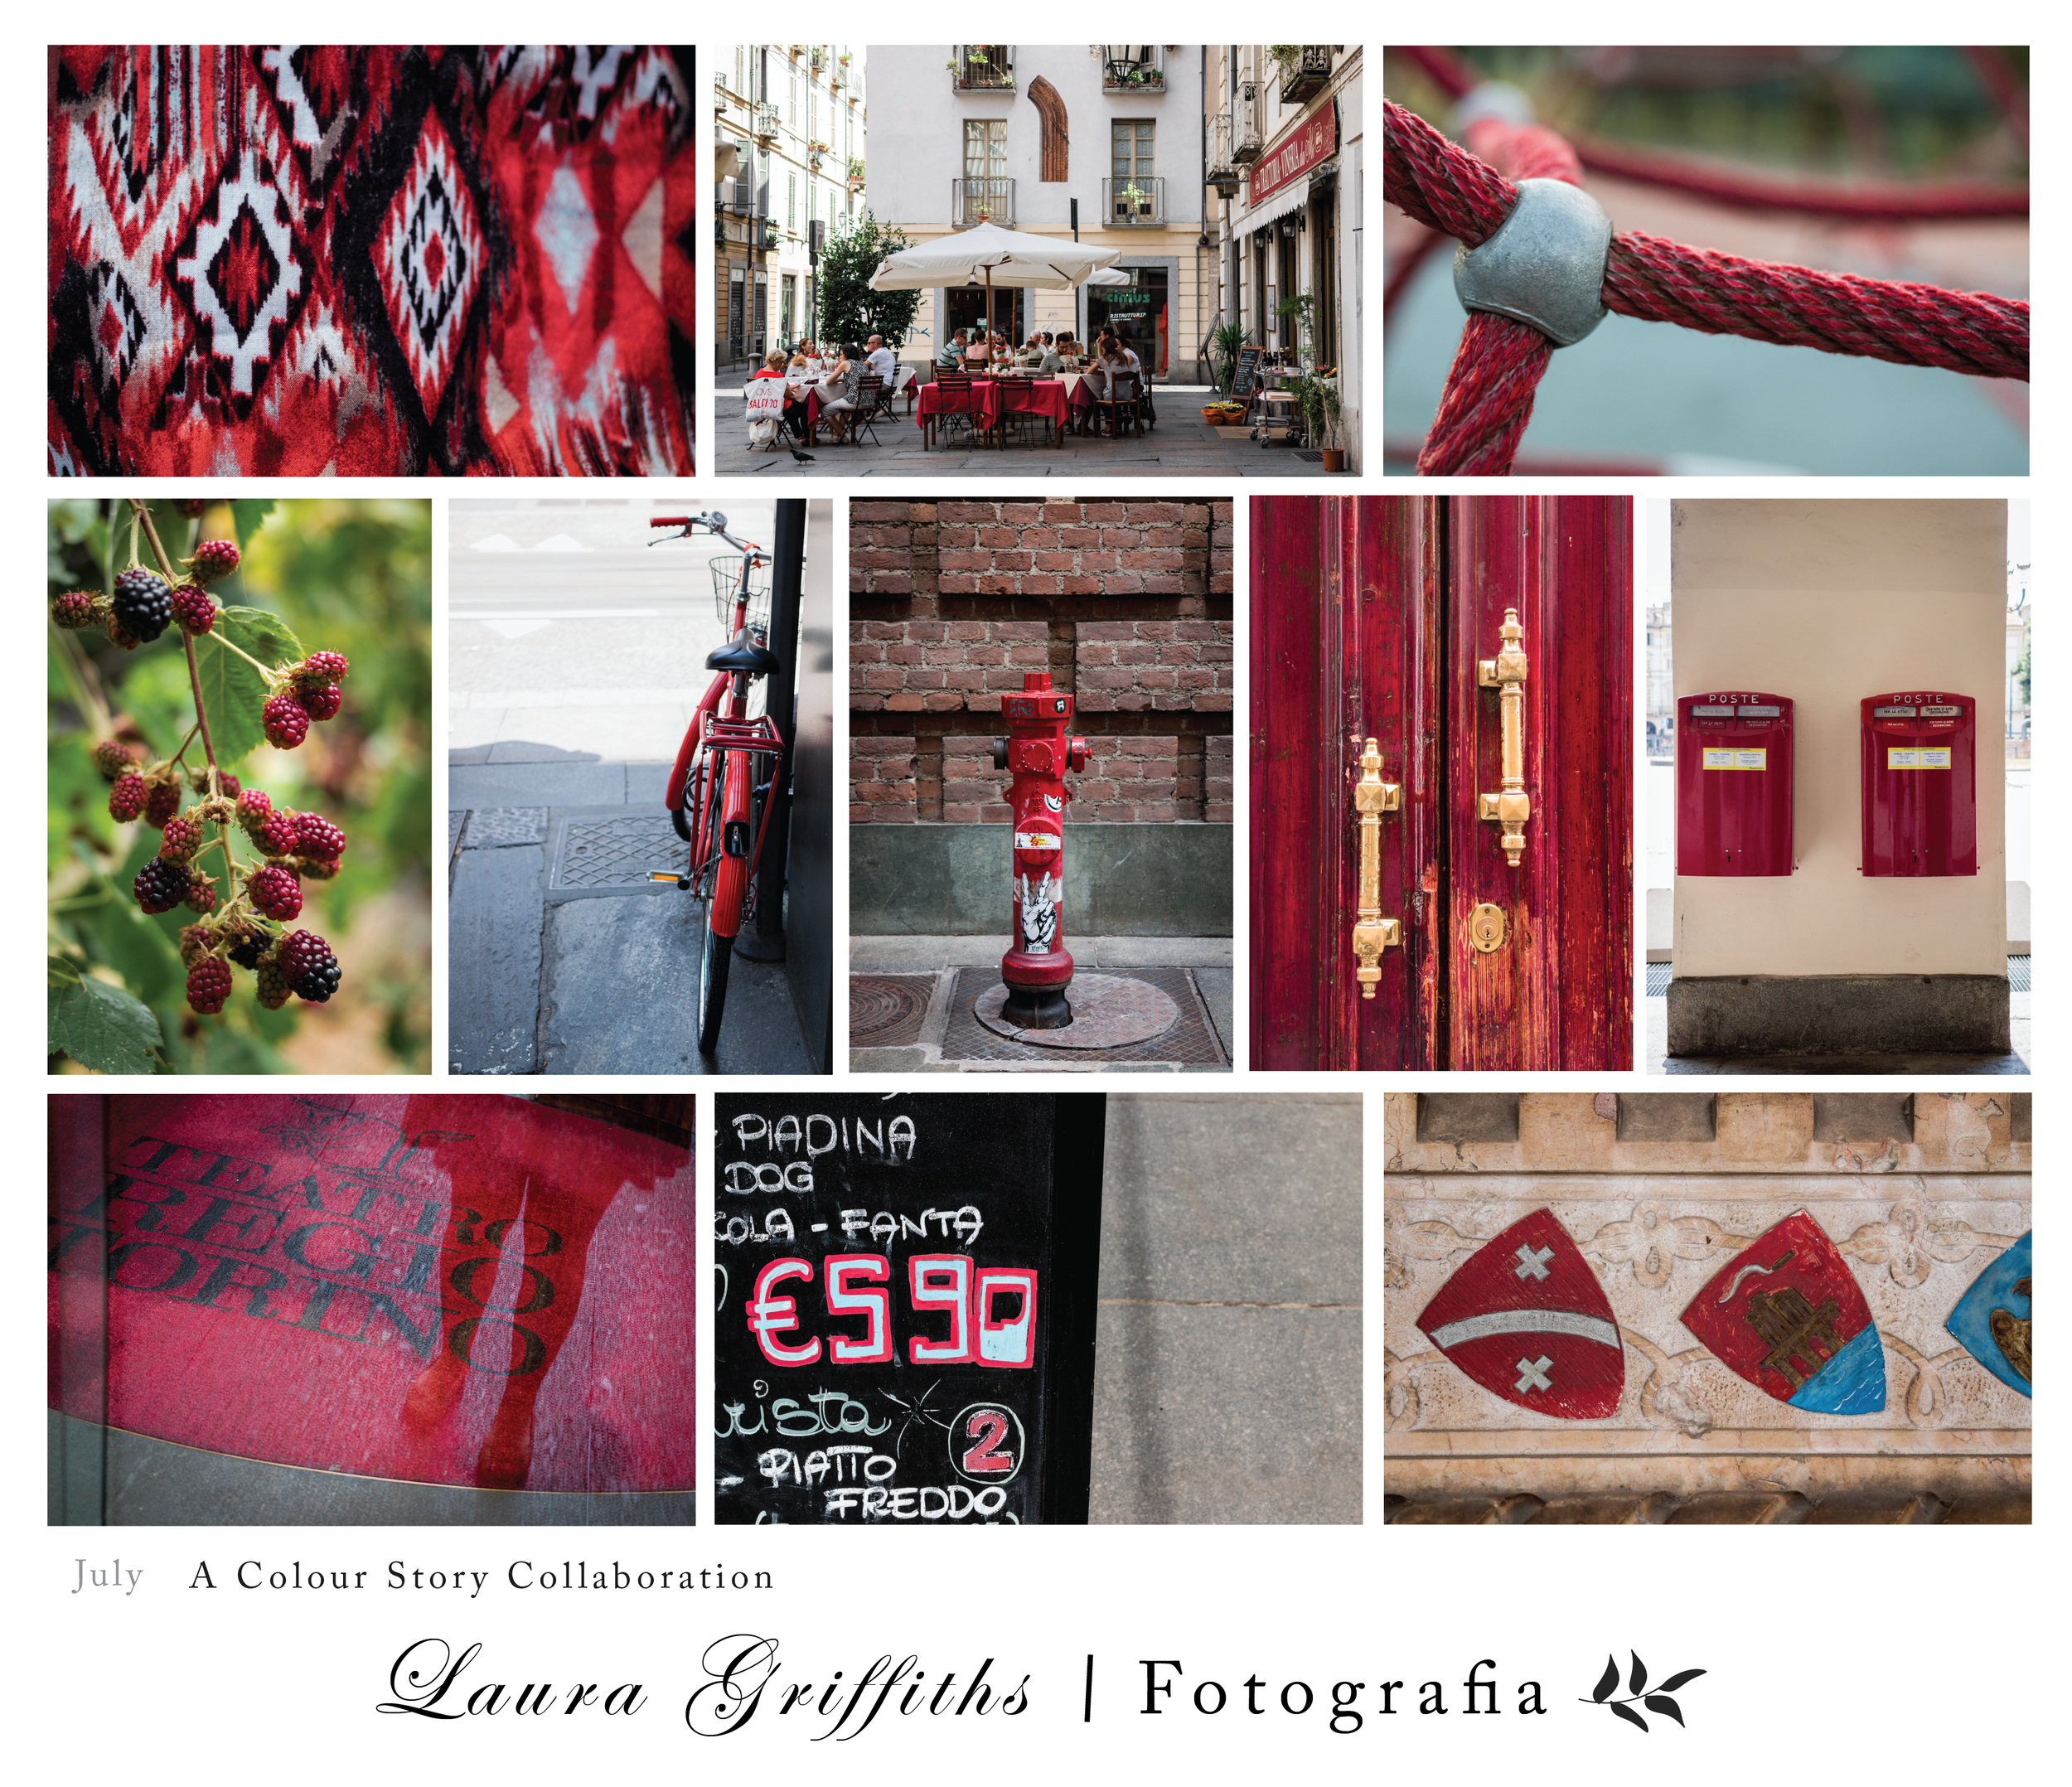 A color story collaboration Laura Griffiths Fotografia Torino Italia